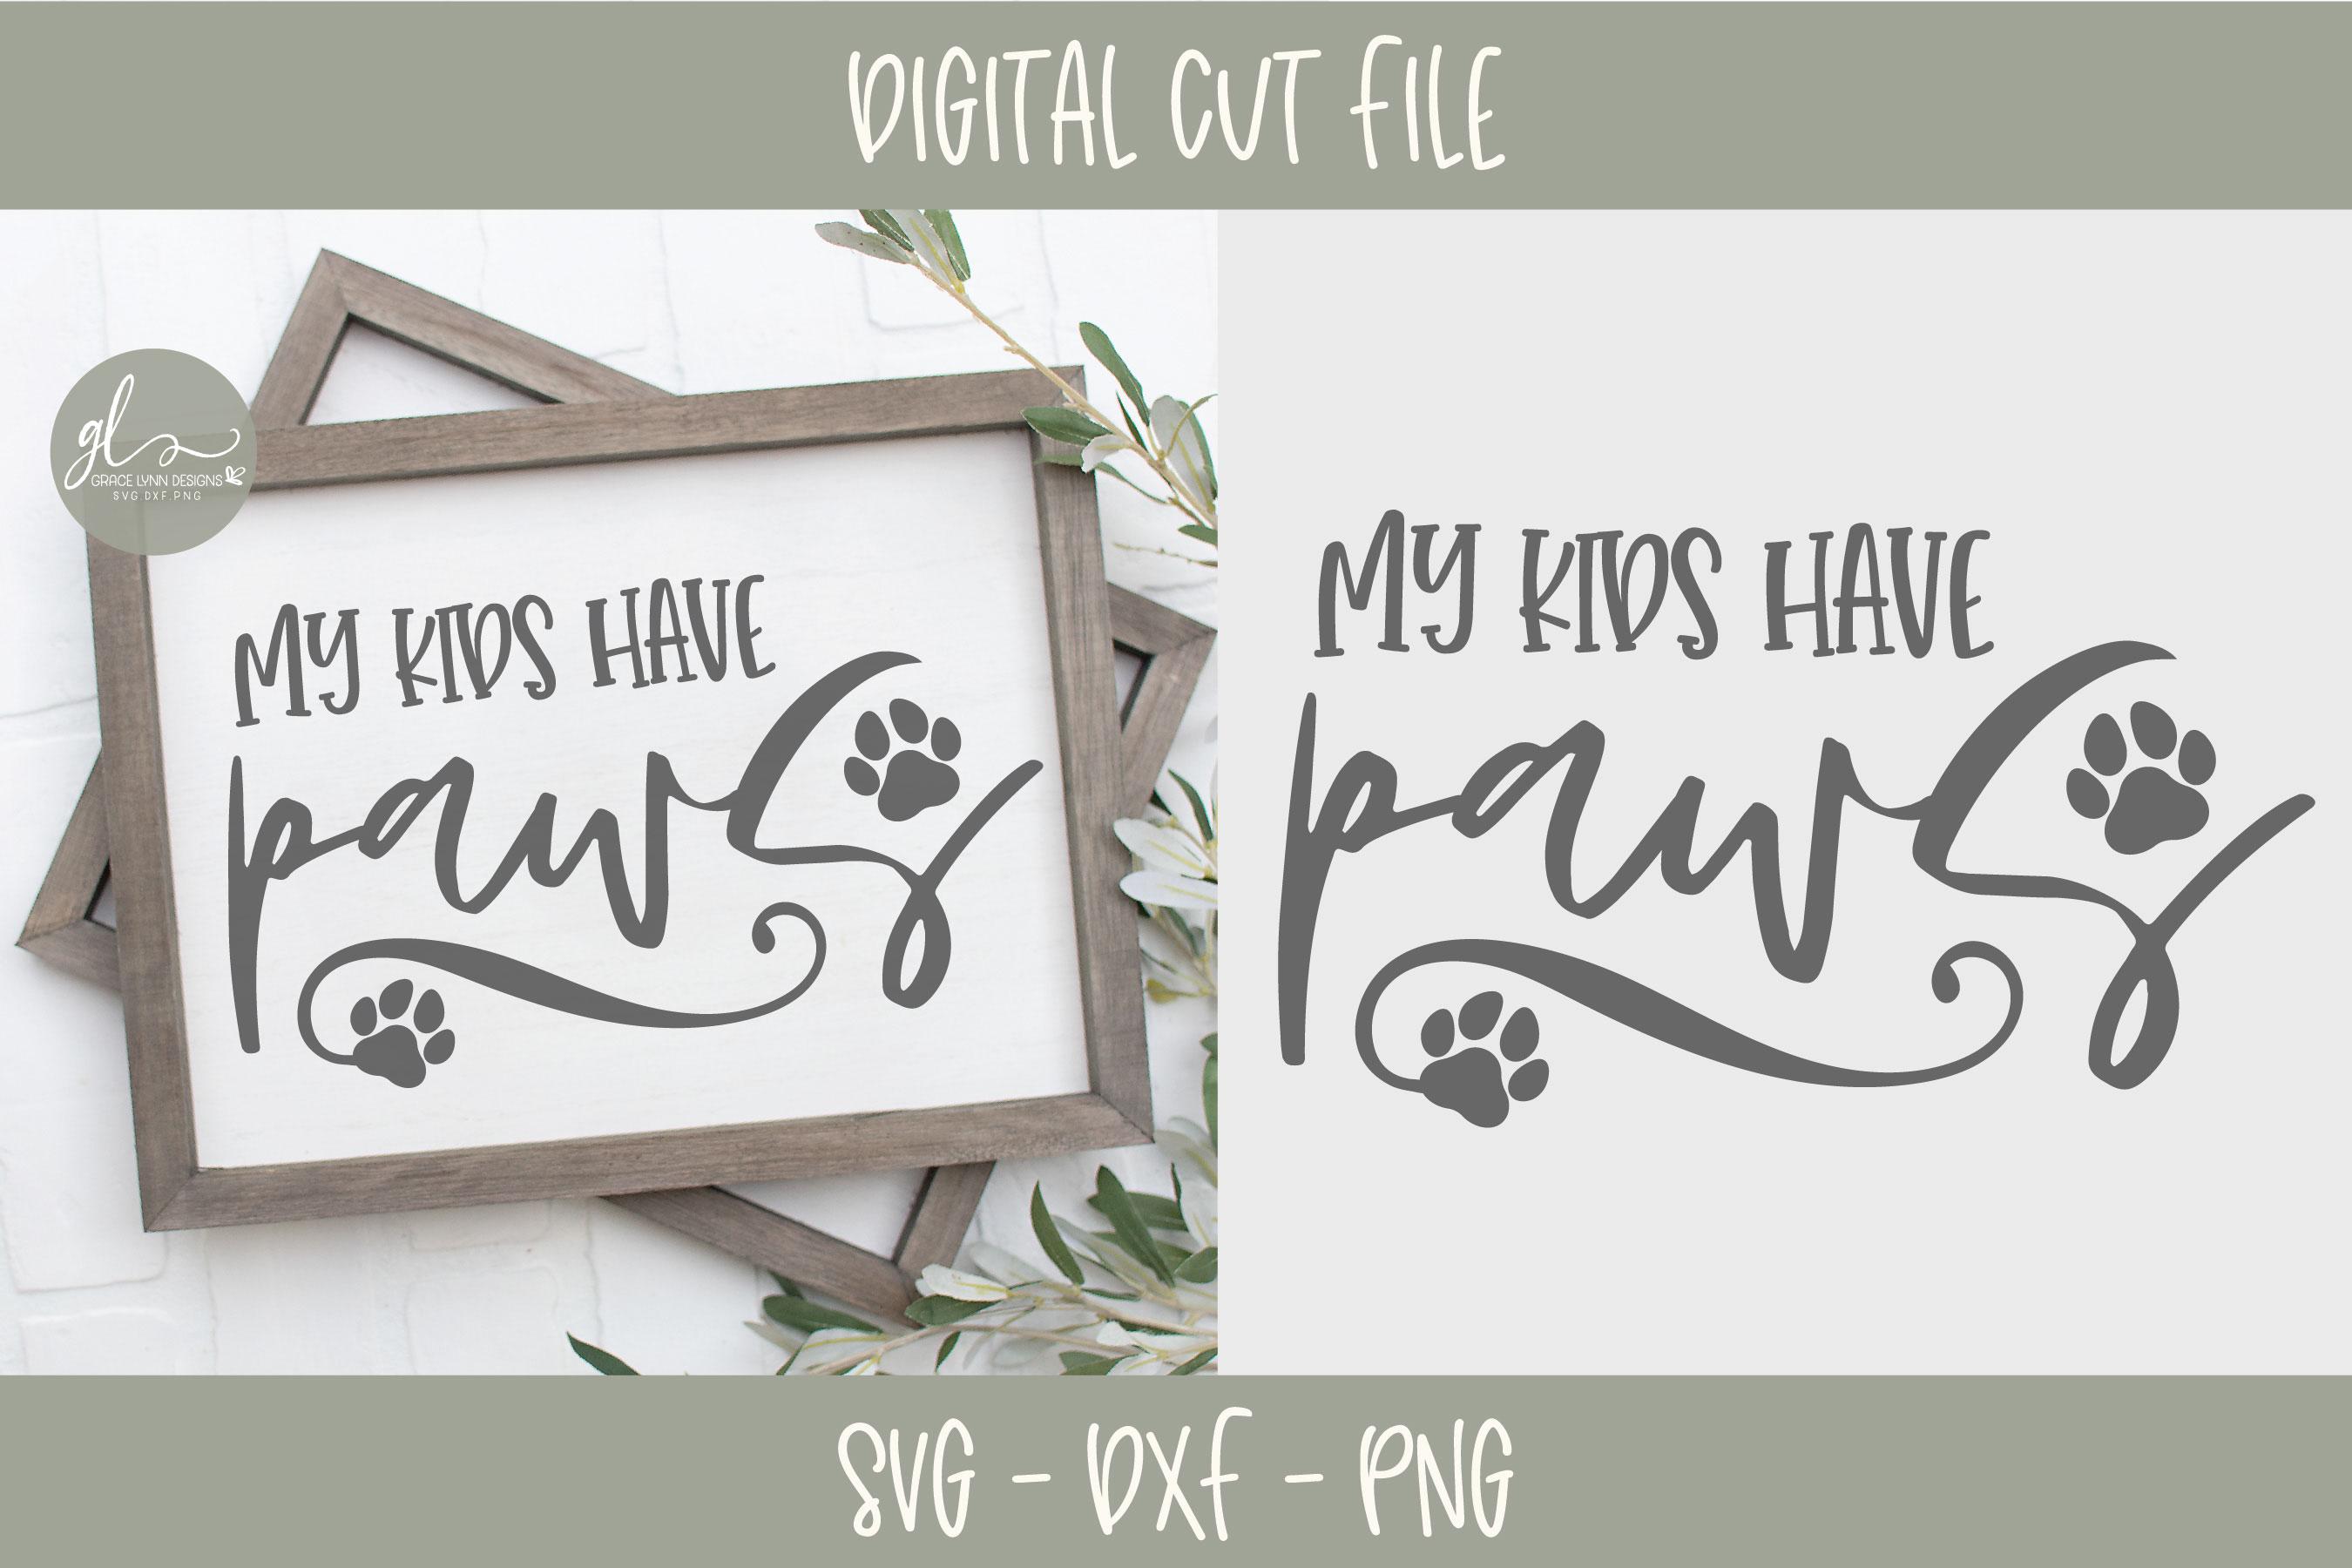 Dog Quotes Bundle Vol. 2 - 10 Designs - SVG Cut Files example image 4